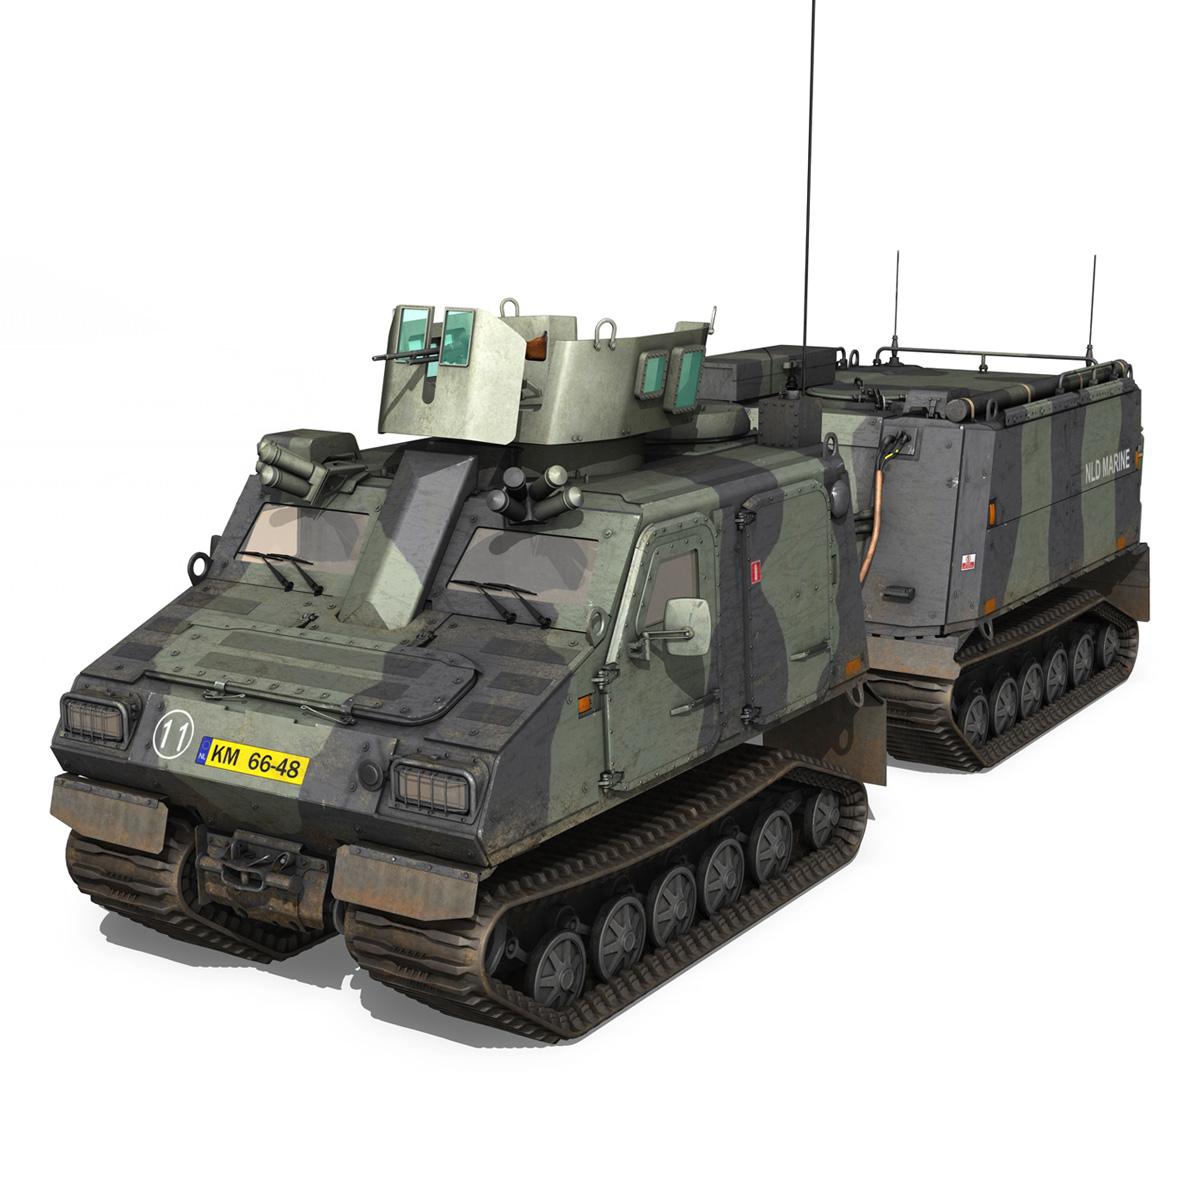 bvs10 viking – netherlands marine corps 3d model 3ds c4d lwo obj 293516